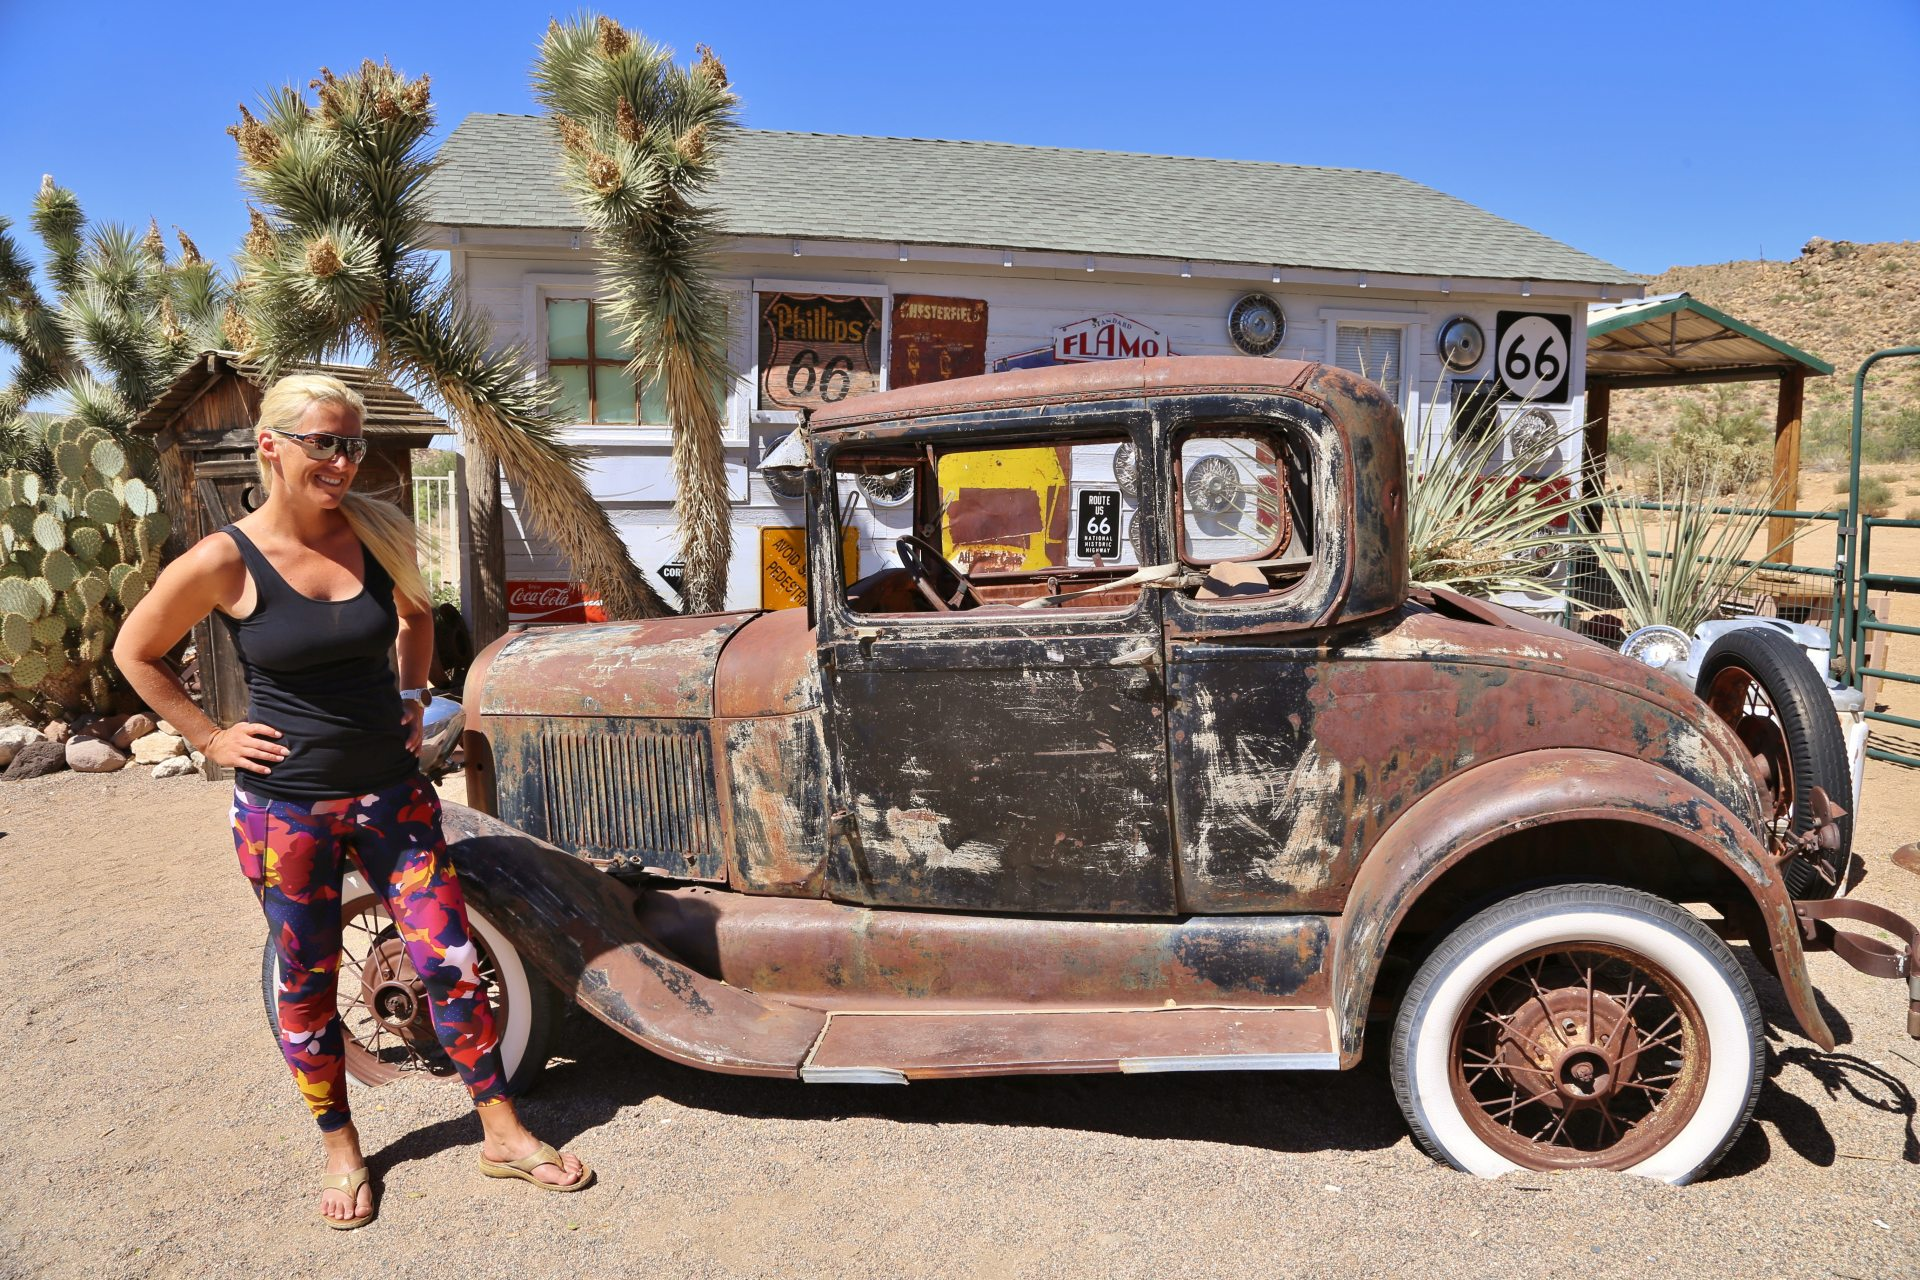 Rusty but Fancy - abandoned, Arizona, Auto, Beschilderung, Blondine, Fahrzeug, Gebäude, Hackberry, Hackberry General Store, Himmel, Kakteen, KFZ, Oldtimer, Palmen, Personen, Portrait, Porträt, rostig, Route 66, Schilder, Yucca - HOFBAUER-HOFMANN Sofia - (Hackberry, Arizona, Vereinigte Staaten)